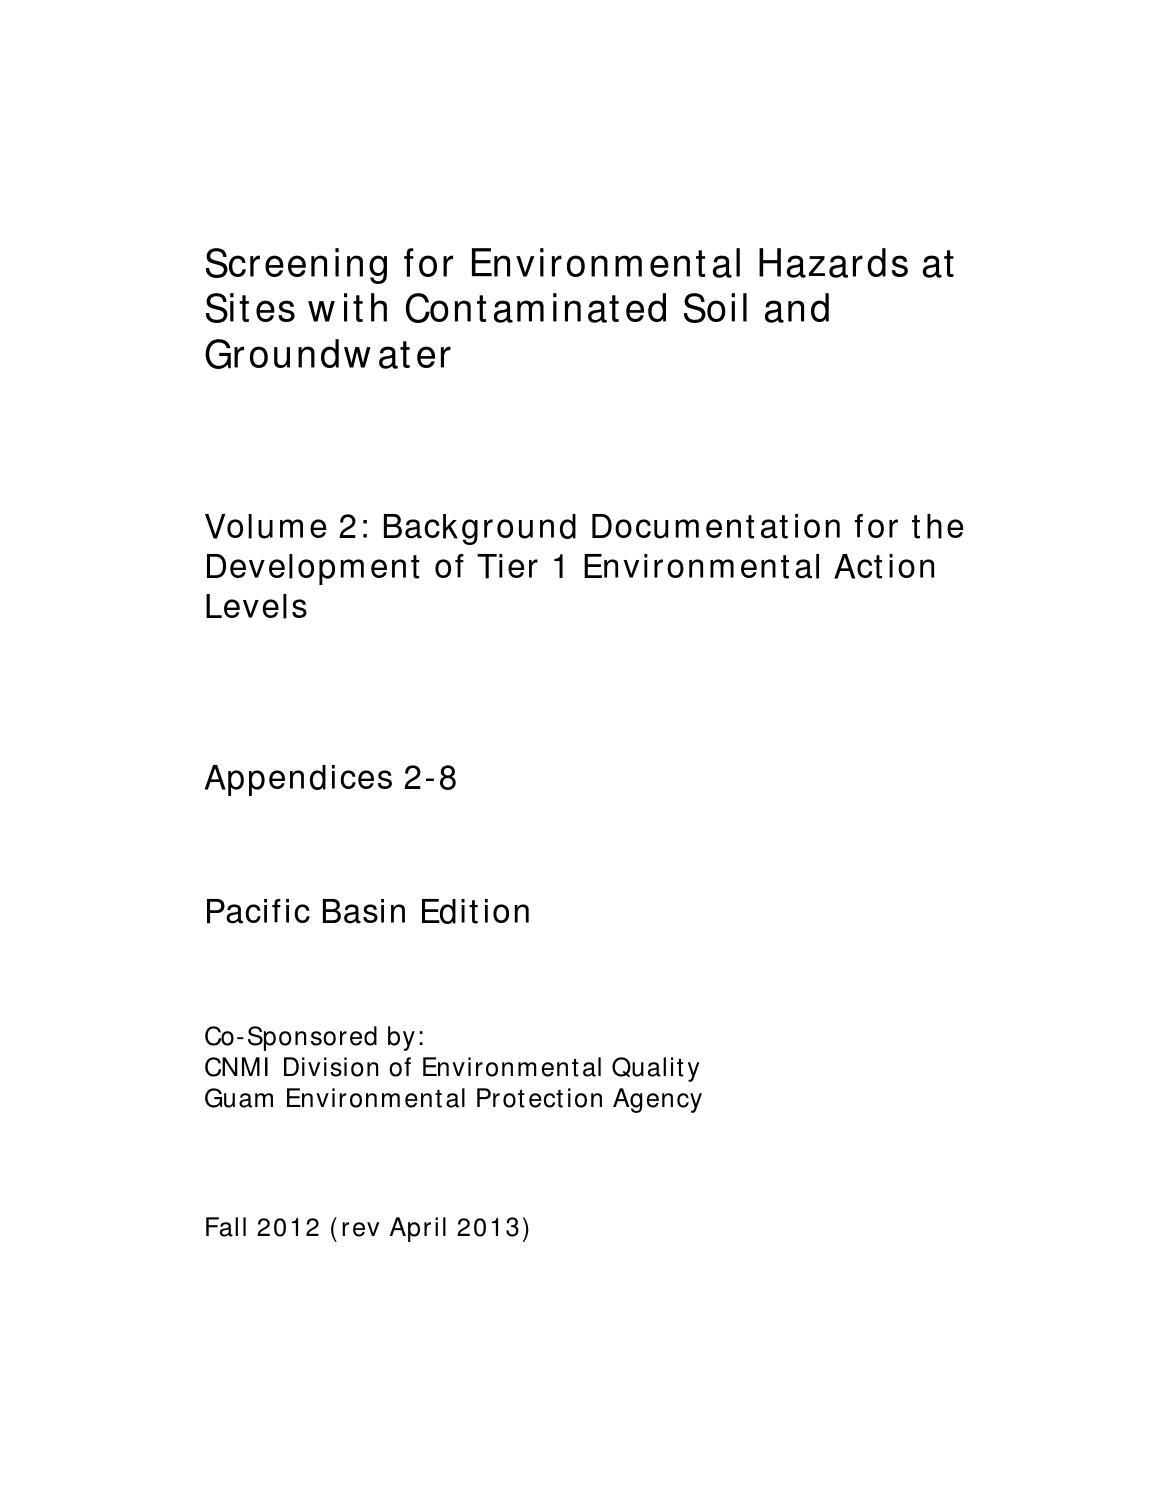 Volume 2 app 2 8 fall 2012 rev april 2013 by Guam Environmental – Groundwater Worksheet